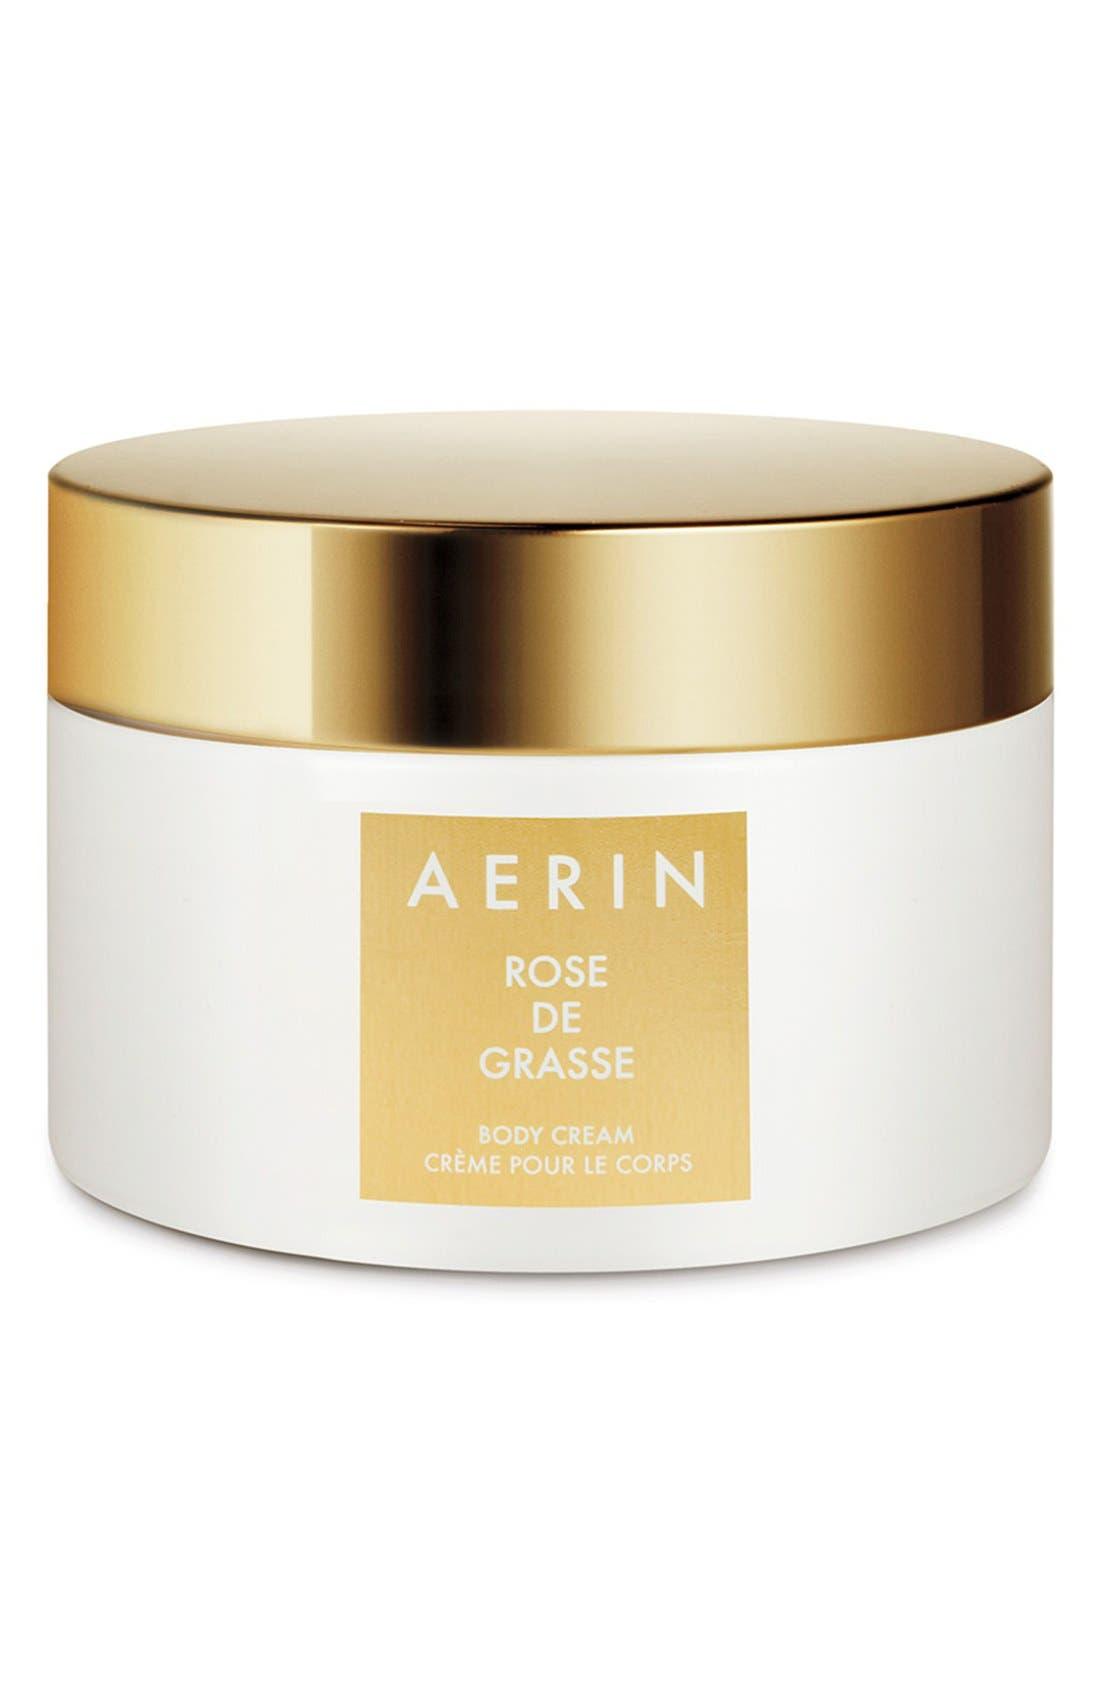 AERIN Beauty Rose de Grasse Body Cream,                         Main,                         color, NO COLOR